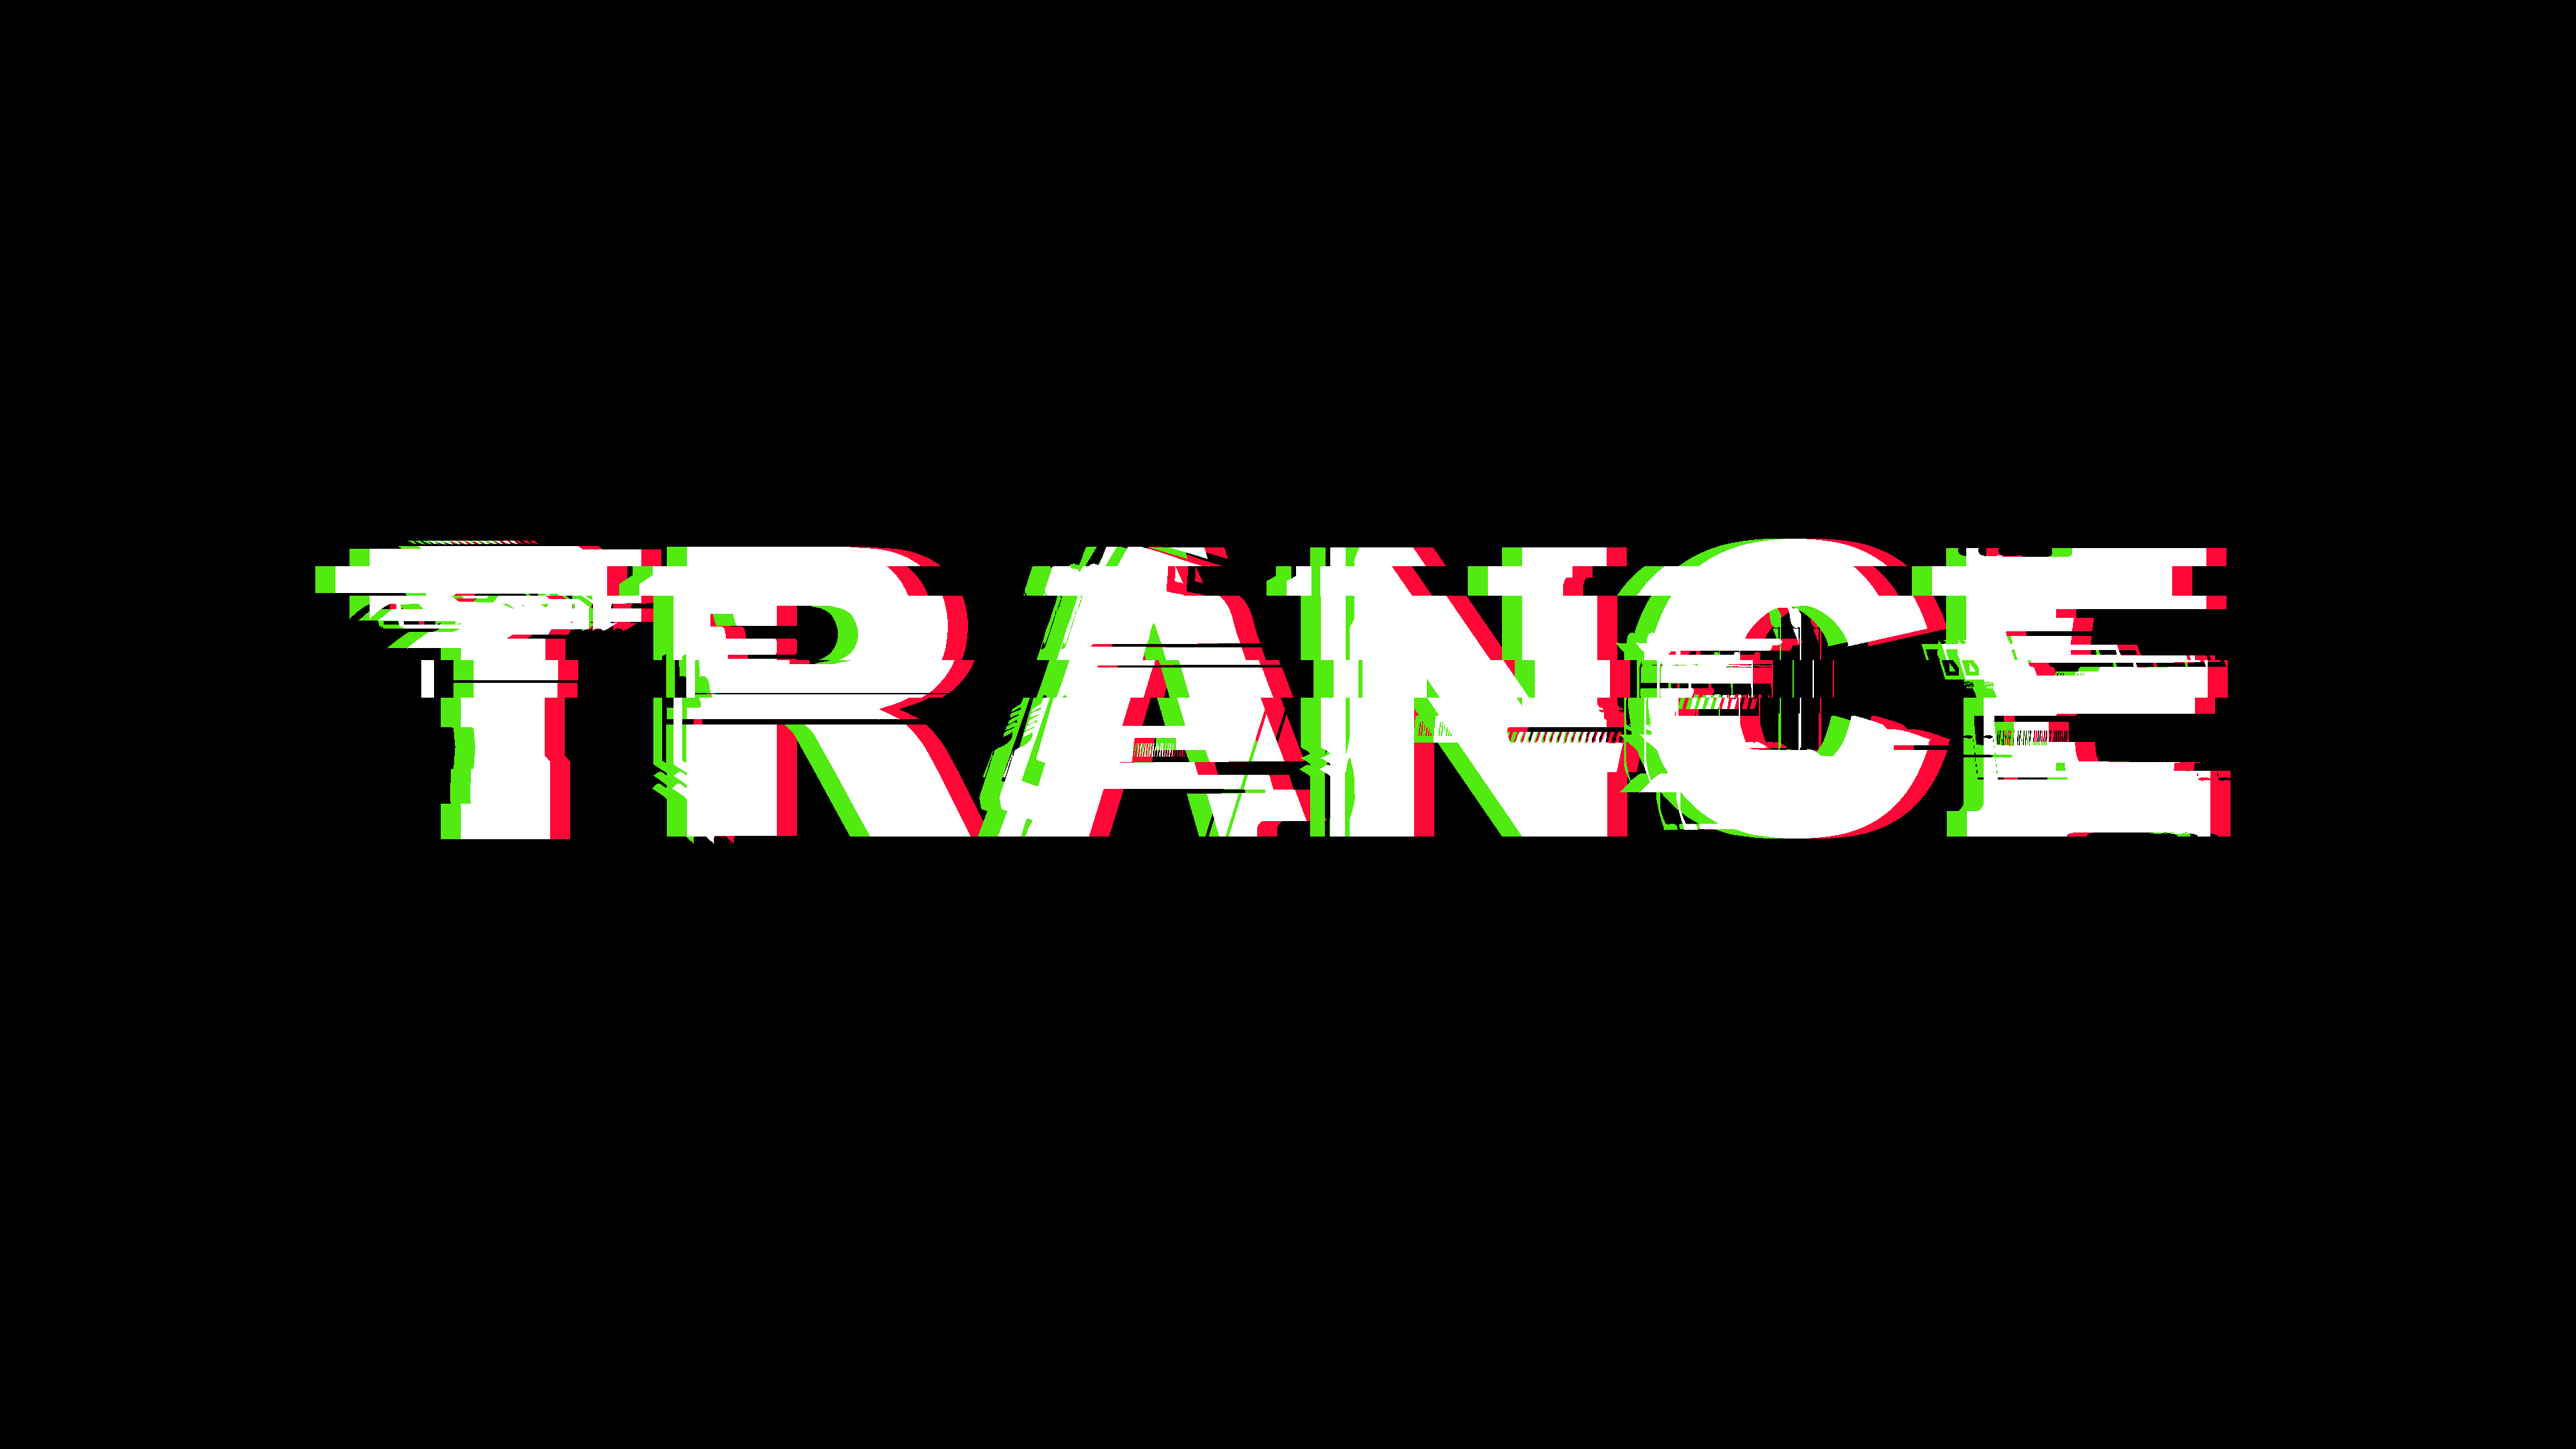 Trance Electronic Music Typography Simple Background Black Background Minimalism 3840x2160